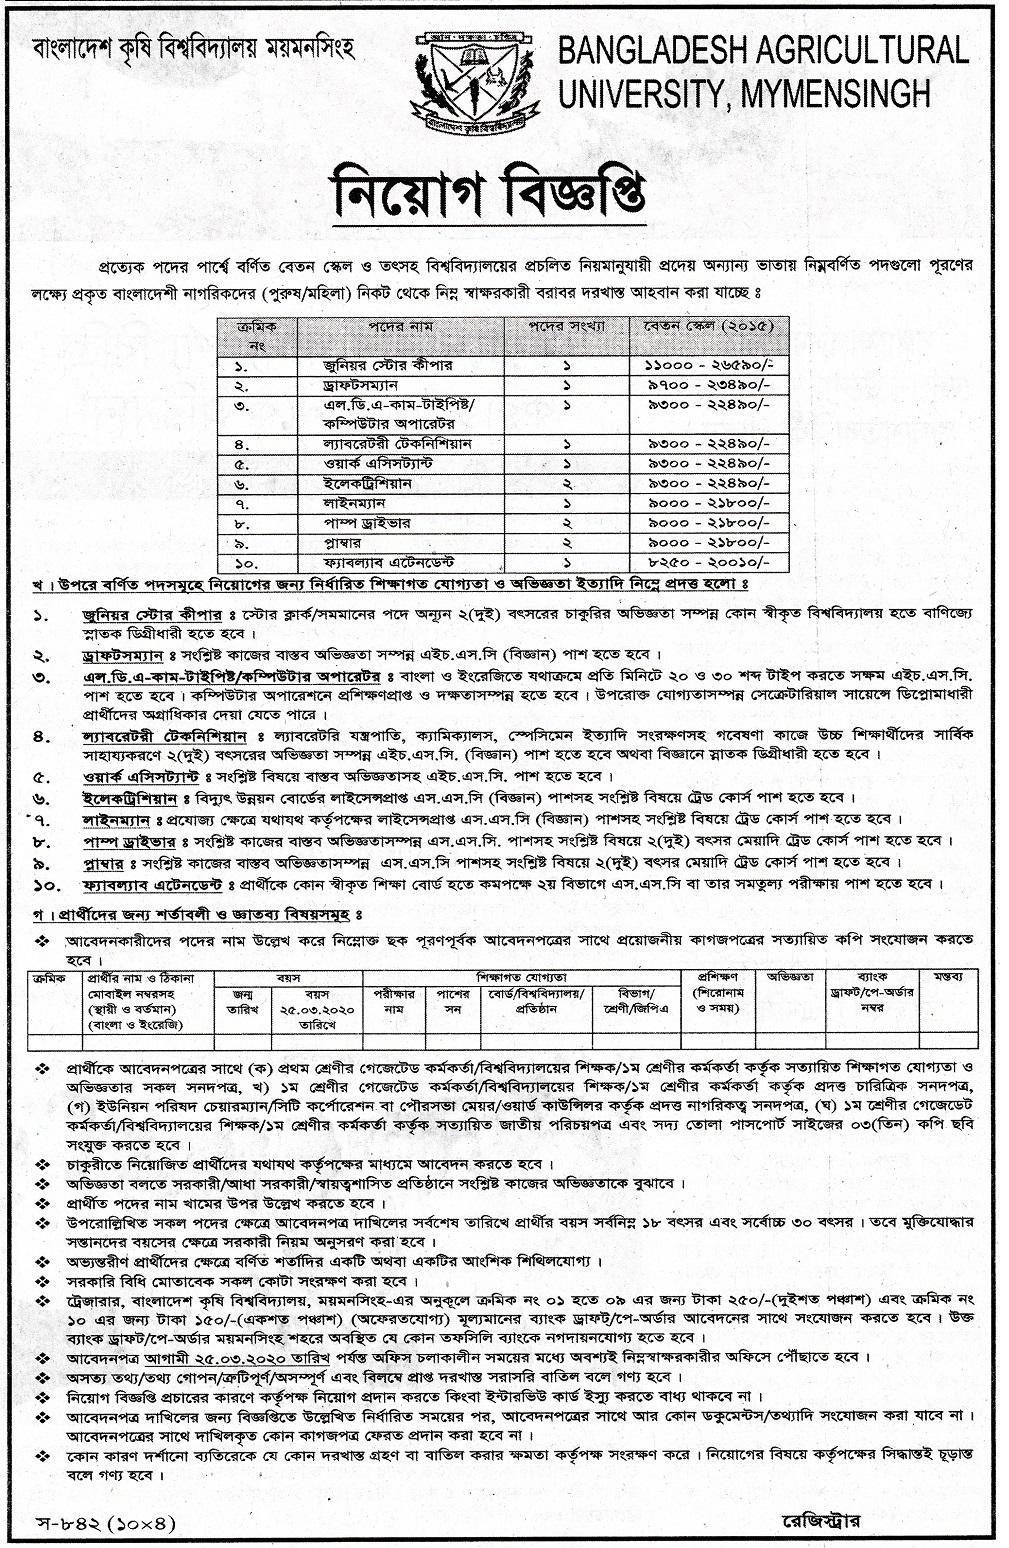 Bangladesh Agricultural University Job Circular 2020